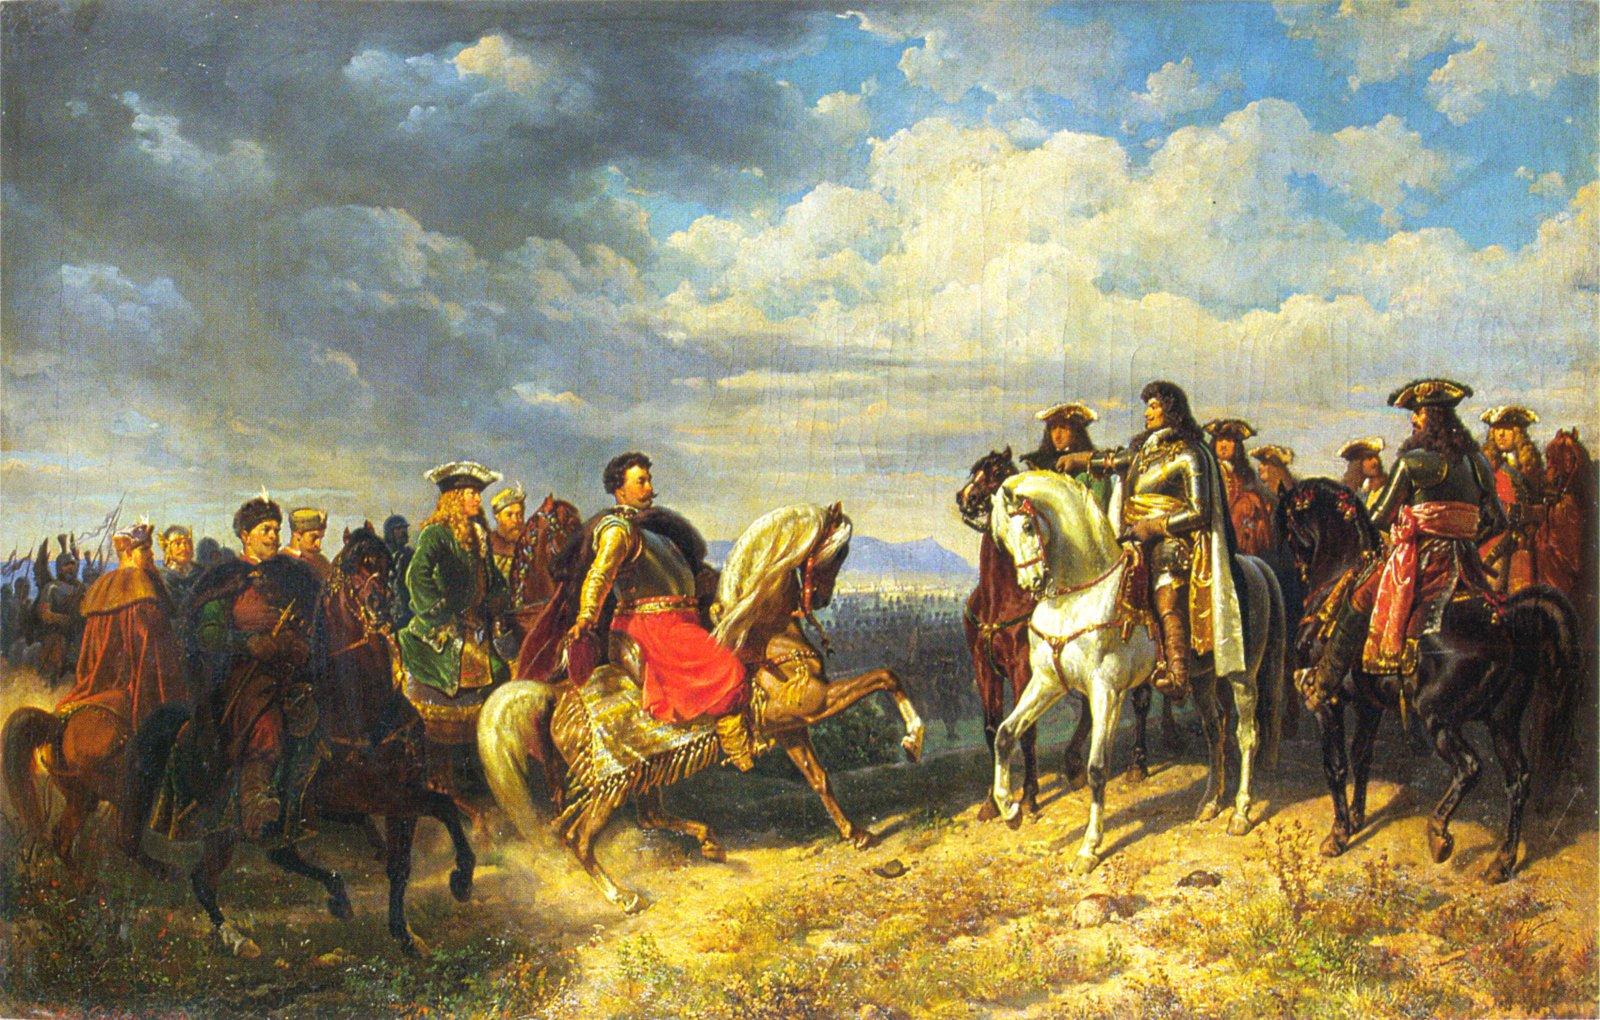 Jan III Sobieski i Leopold I pod Schwechat, Artur Grottger